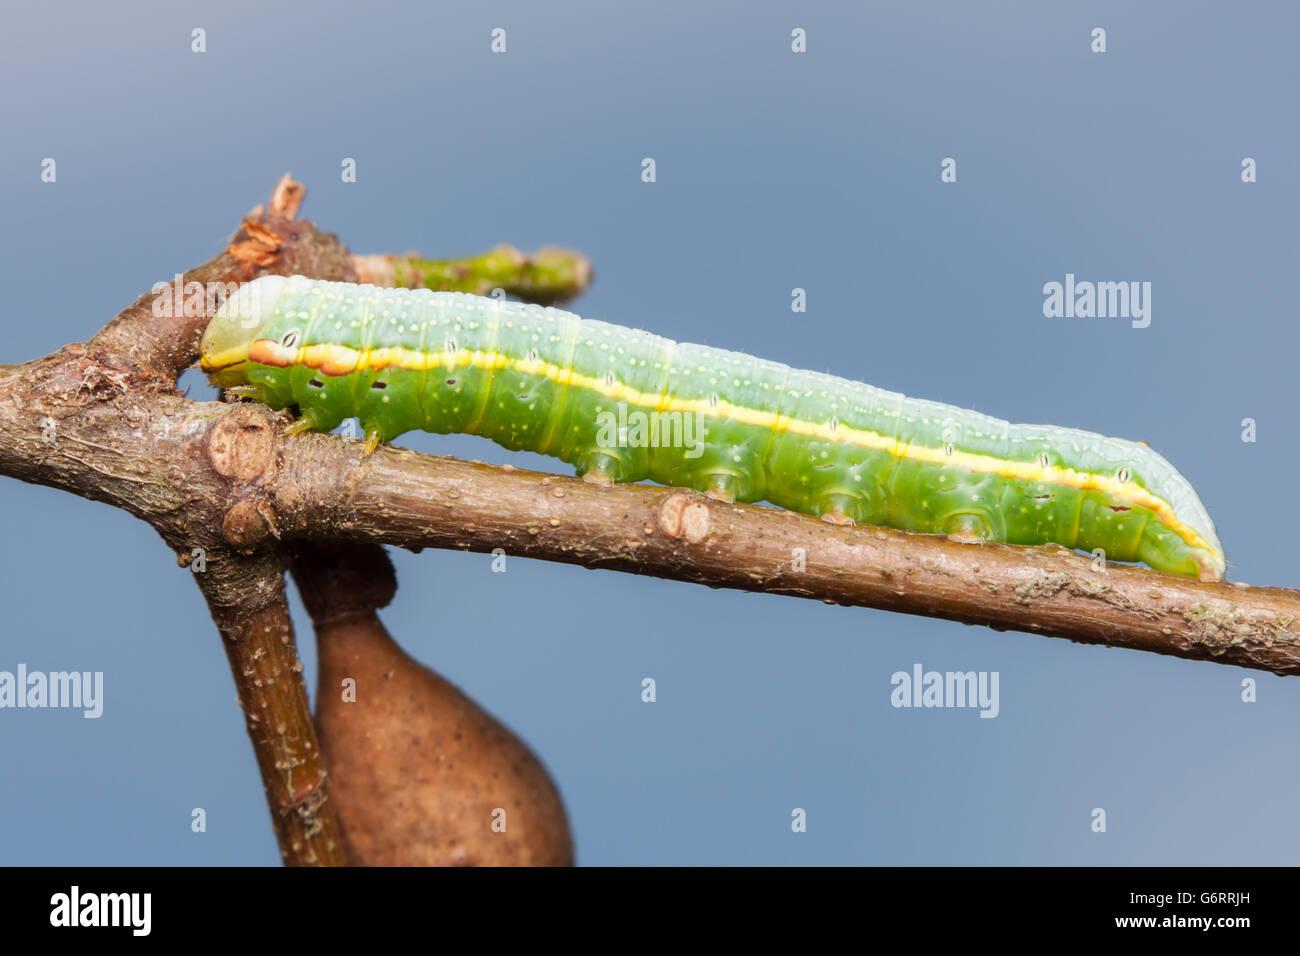 An Anglulose prominent (Peridea angulosa) caterpillar (larva) perches on an oak tree branch. - Stock Image